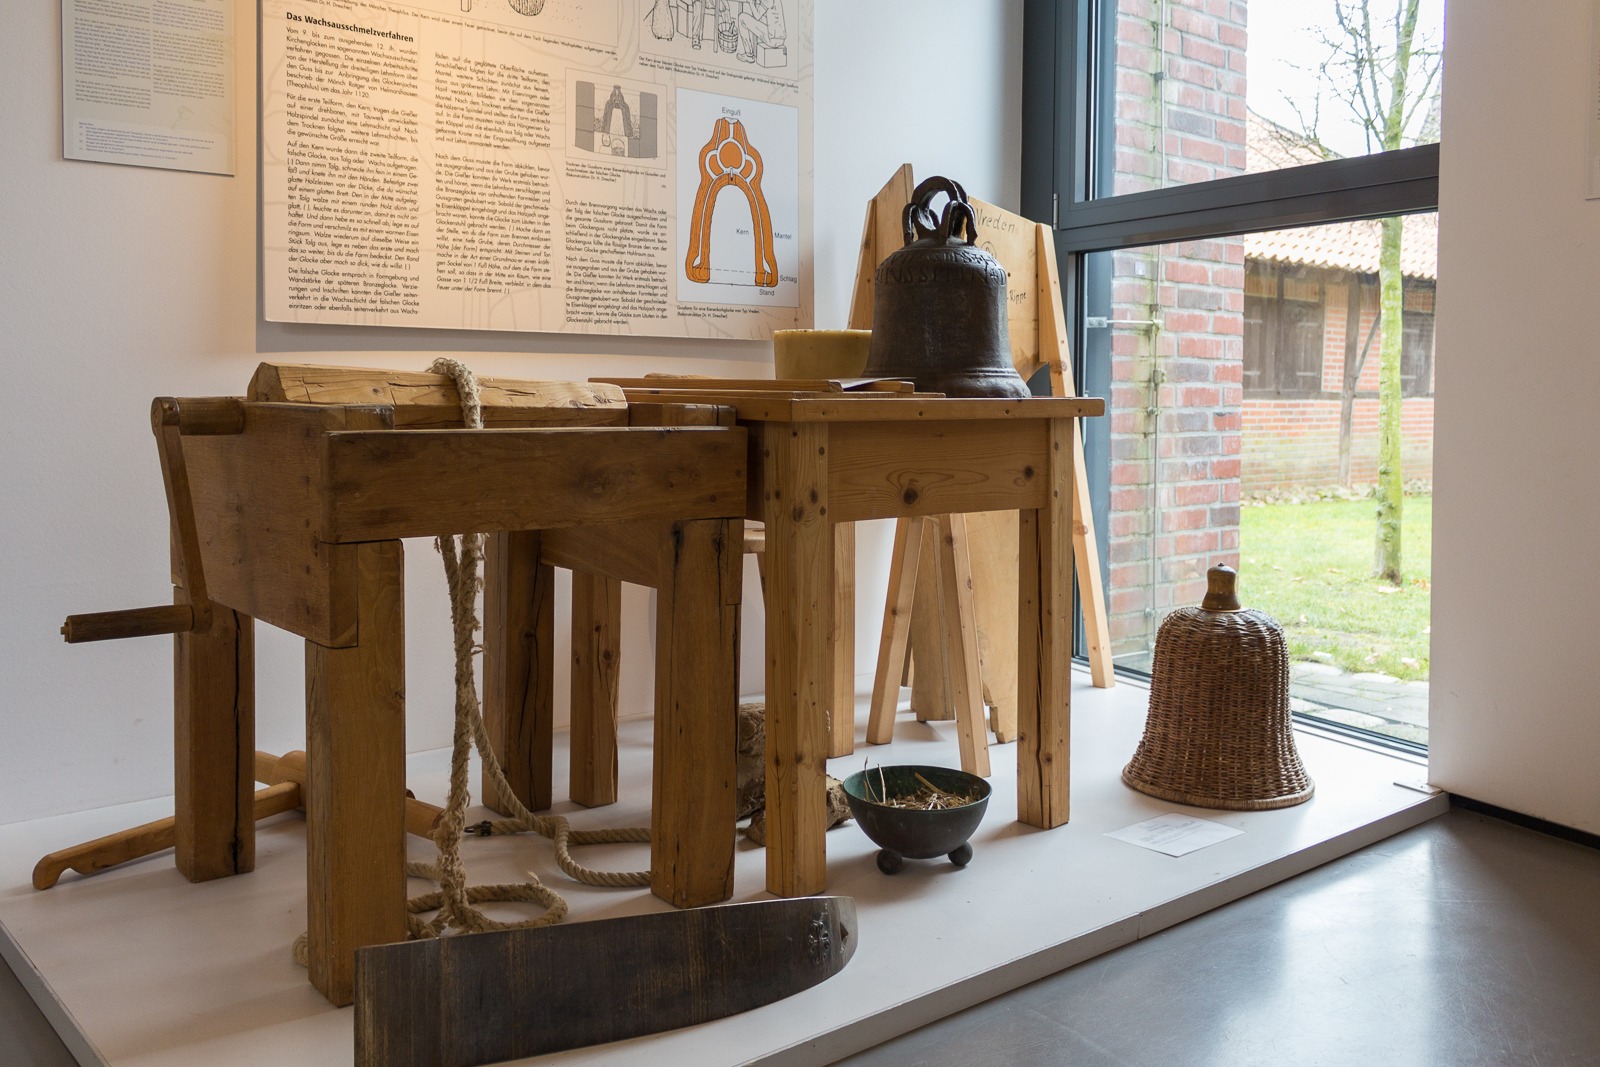 westfaelisches_glockenmuseum-2430